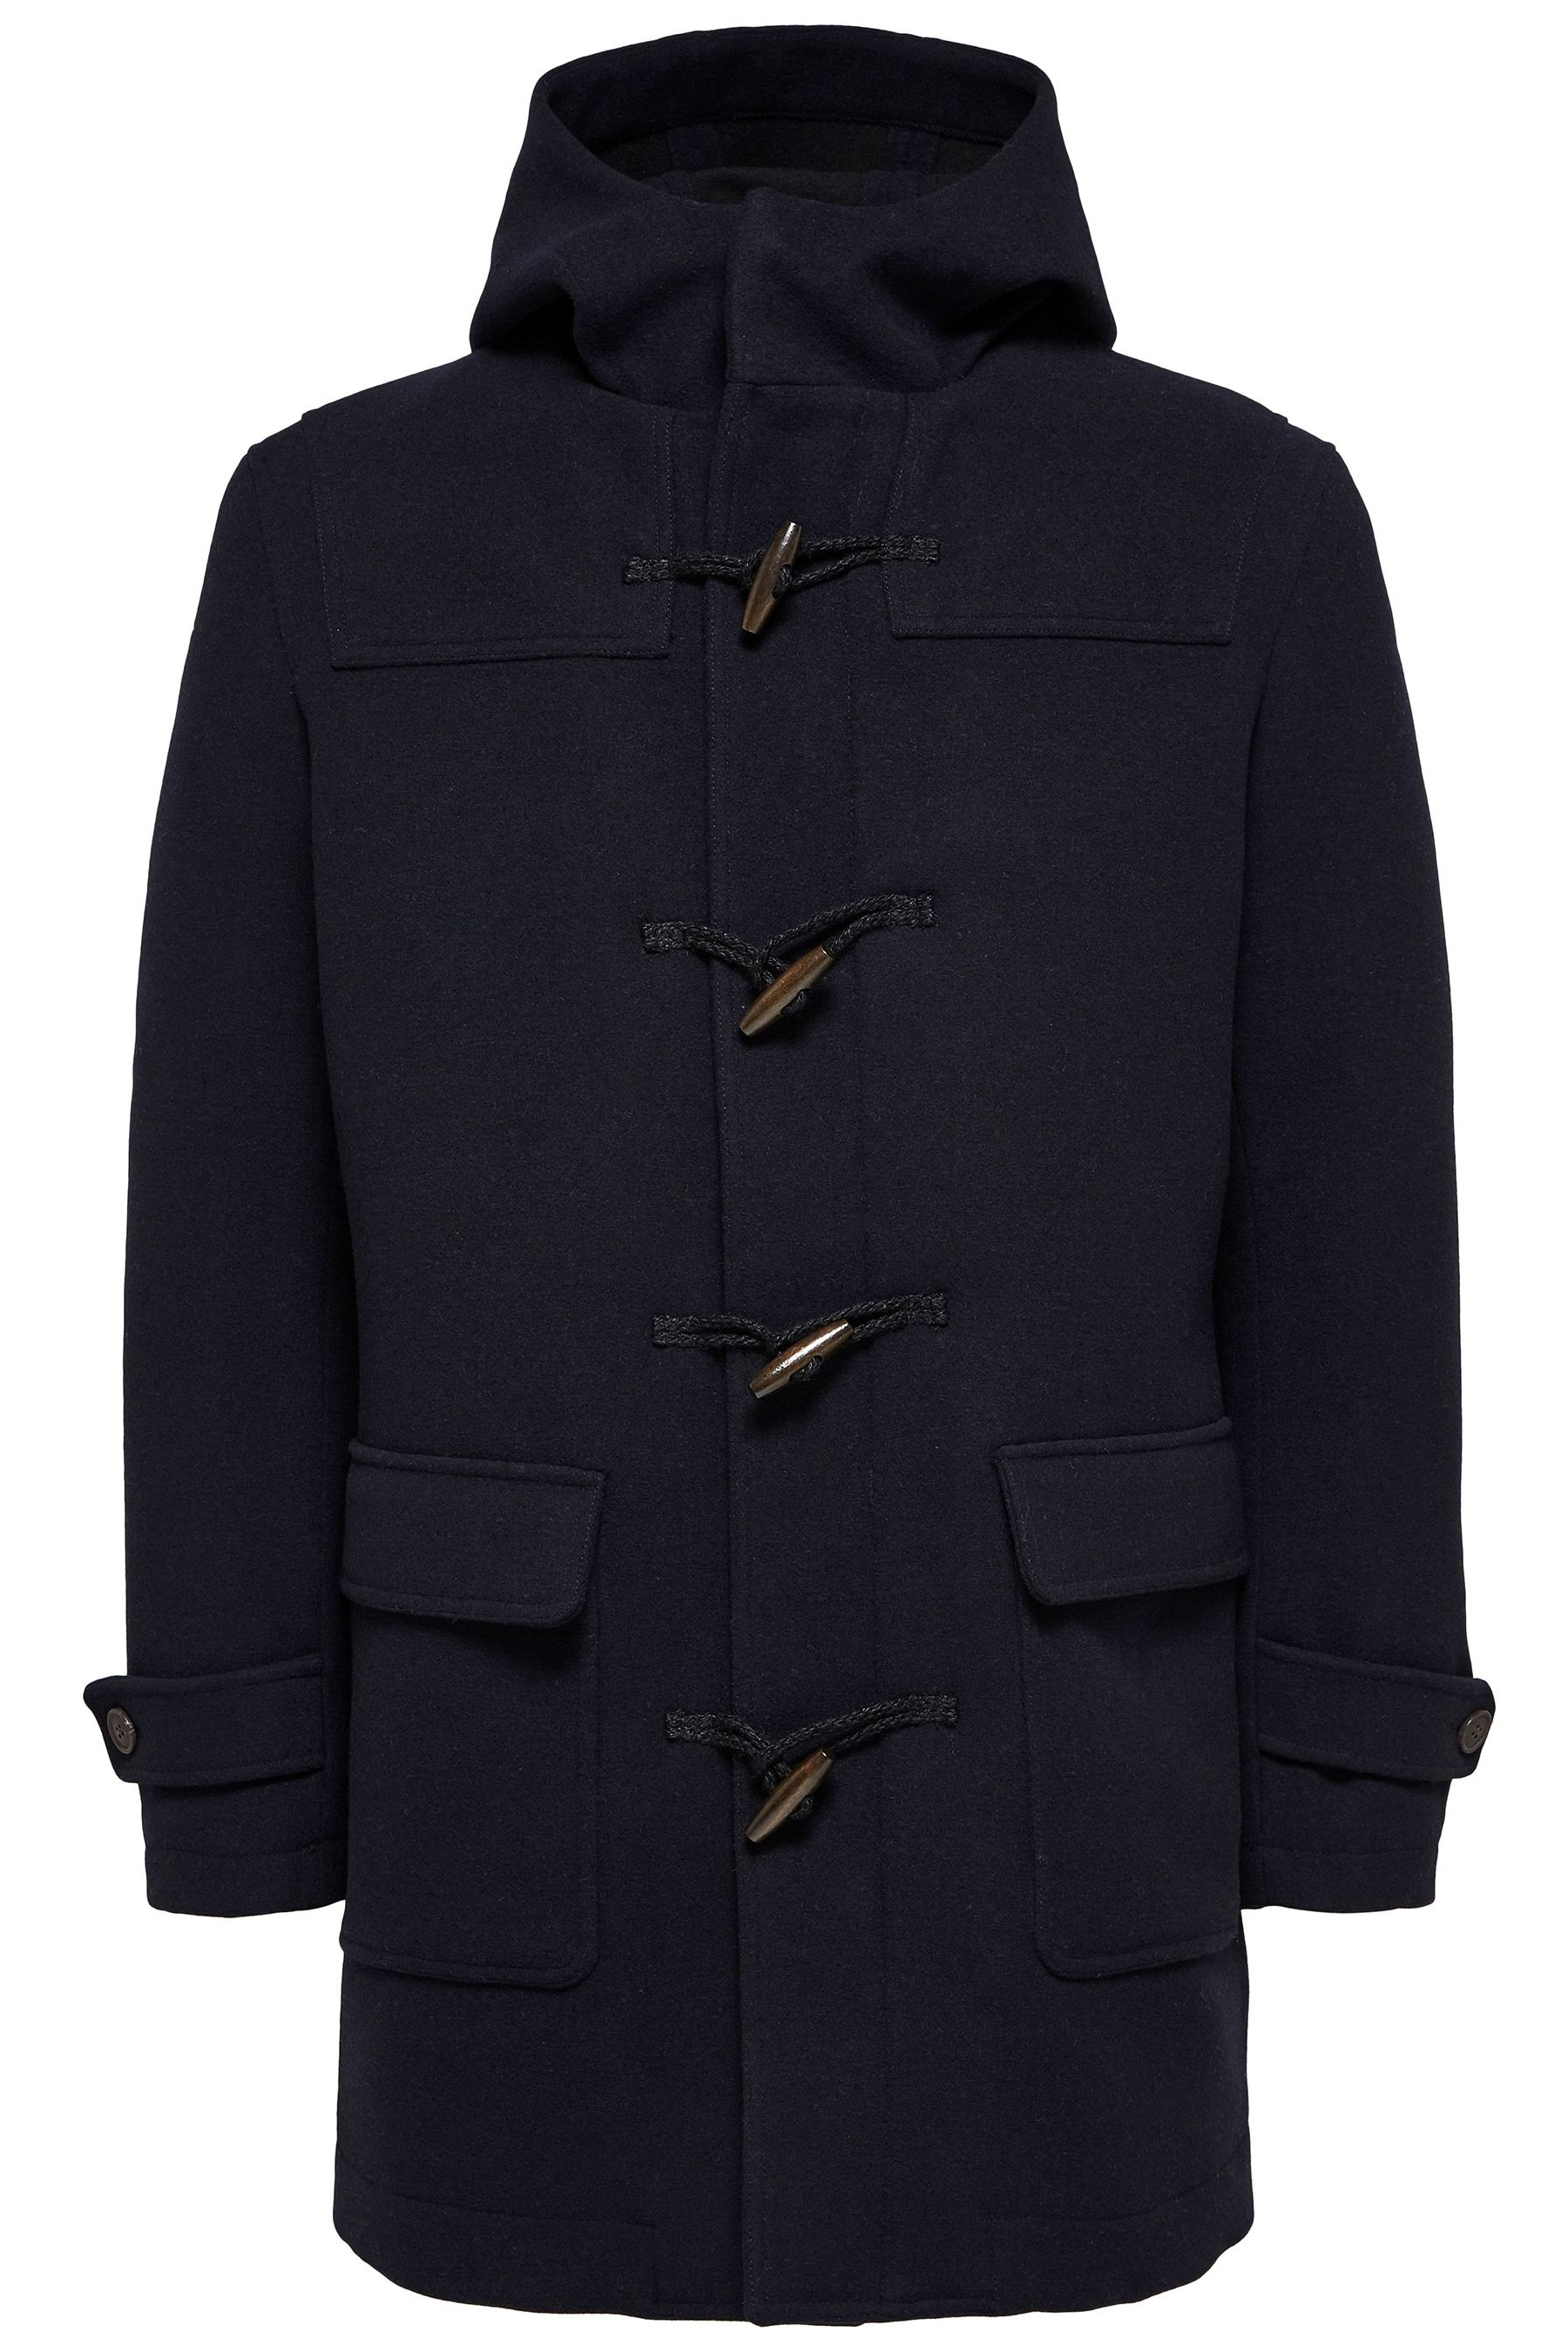 Bedrägeri Klaga djup  Mens Selected Homme Duffel Wool Coat - Blue | Coat, Wool coat ...